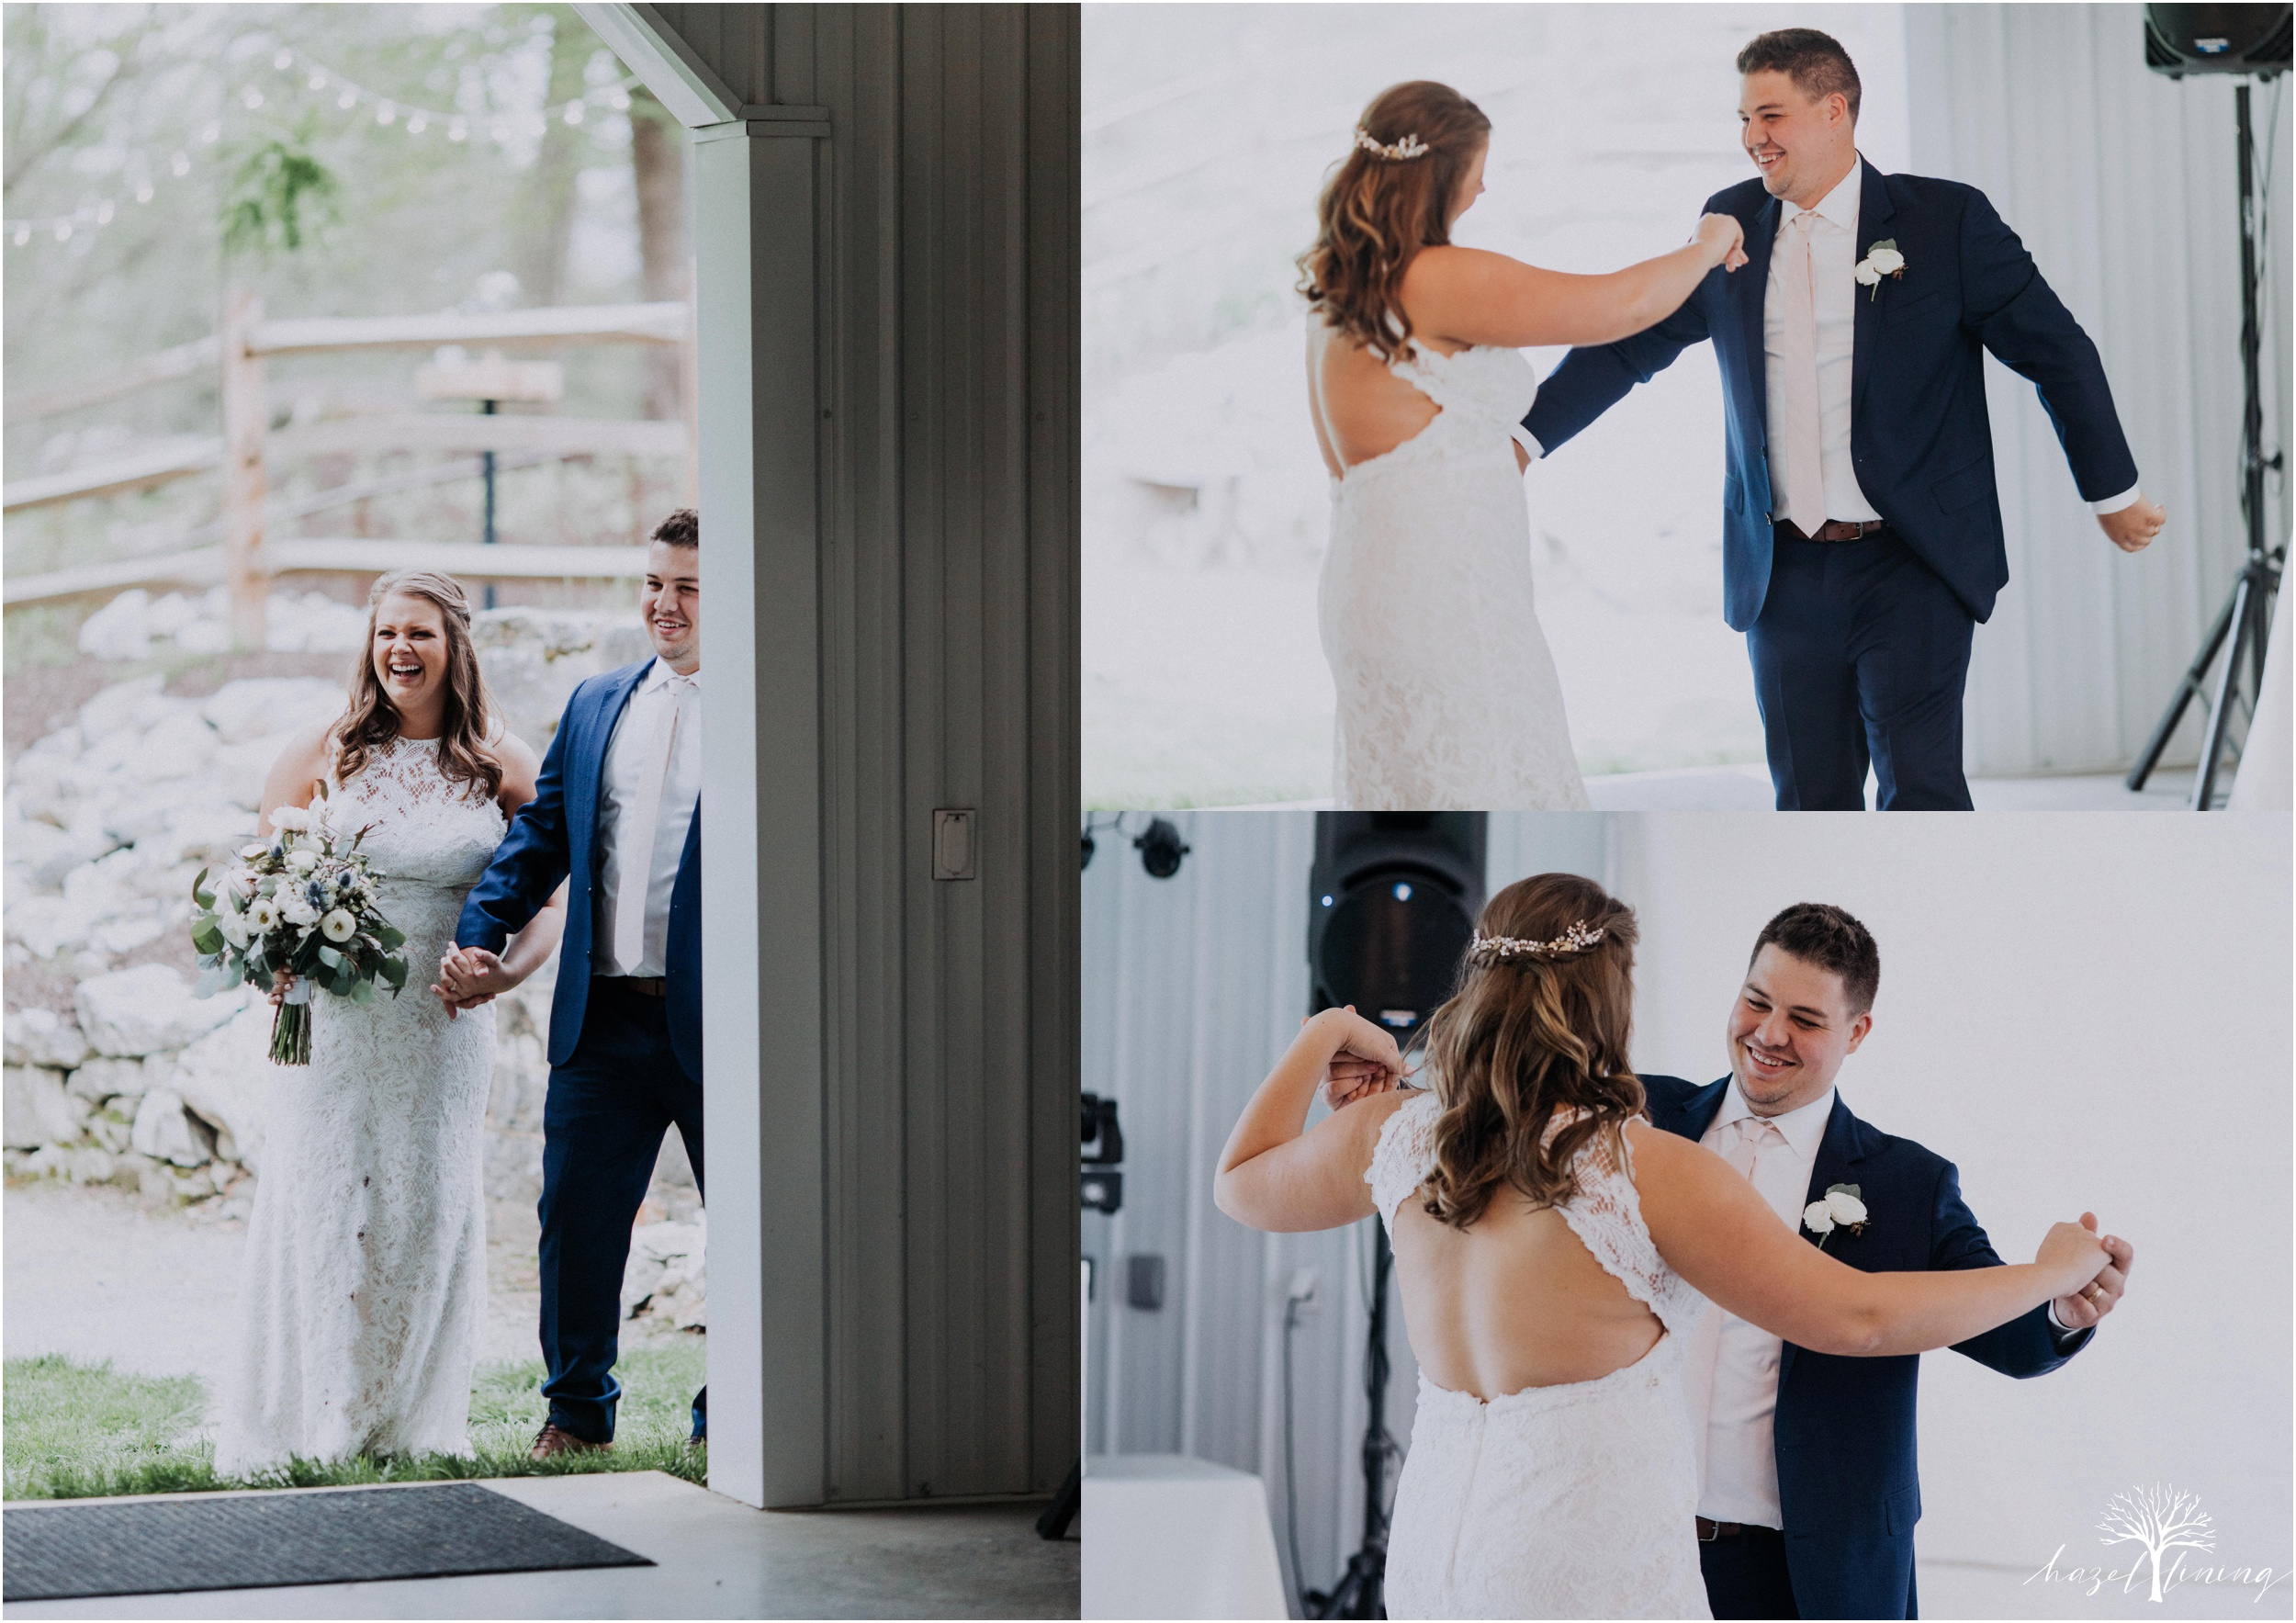 hazel-lining-travel-wedding-elopement-photography-abby-skyler-hunt-the-willis-house-york-pennsylvania-outdoor-estate-wedding_0107.jpg